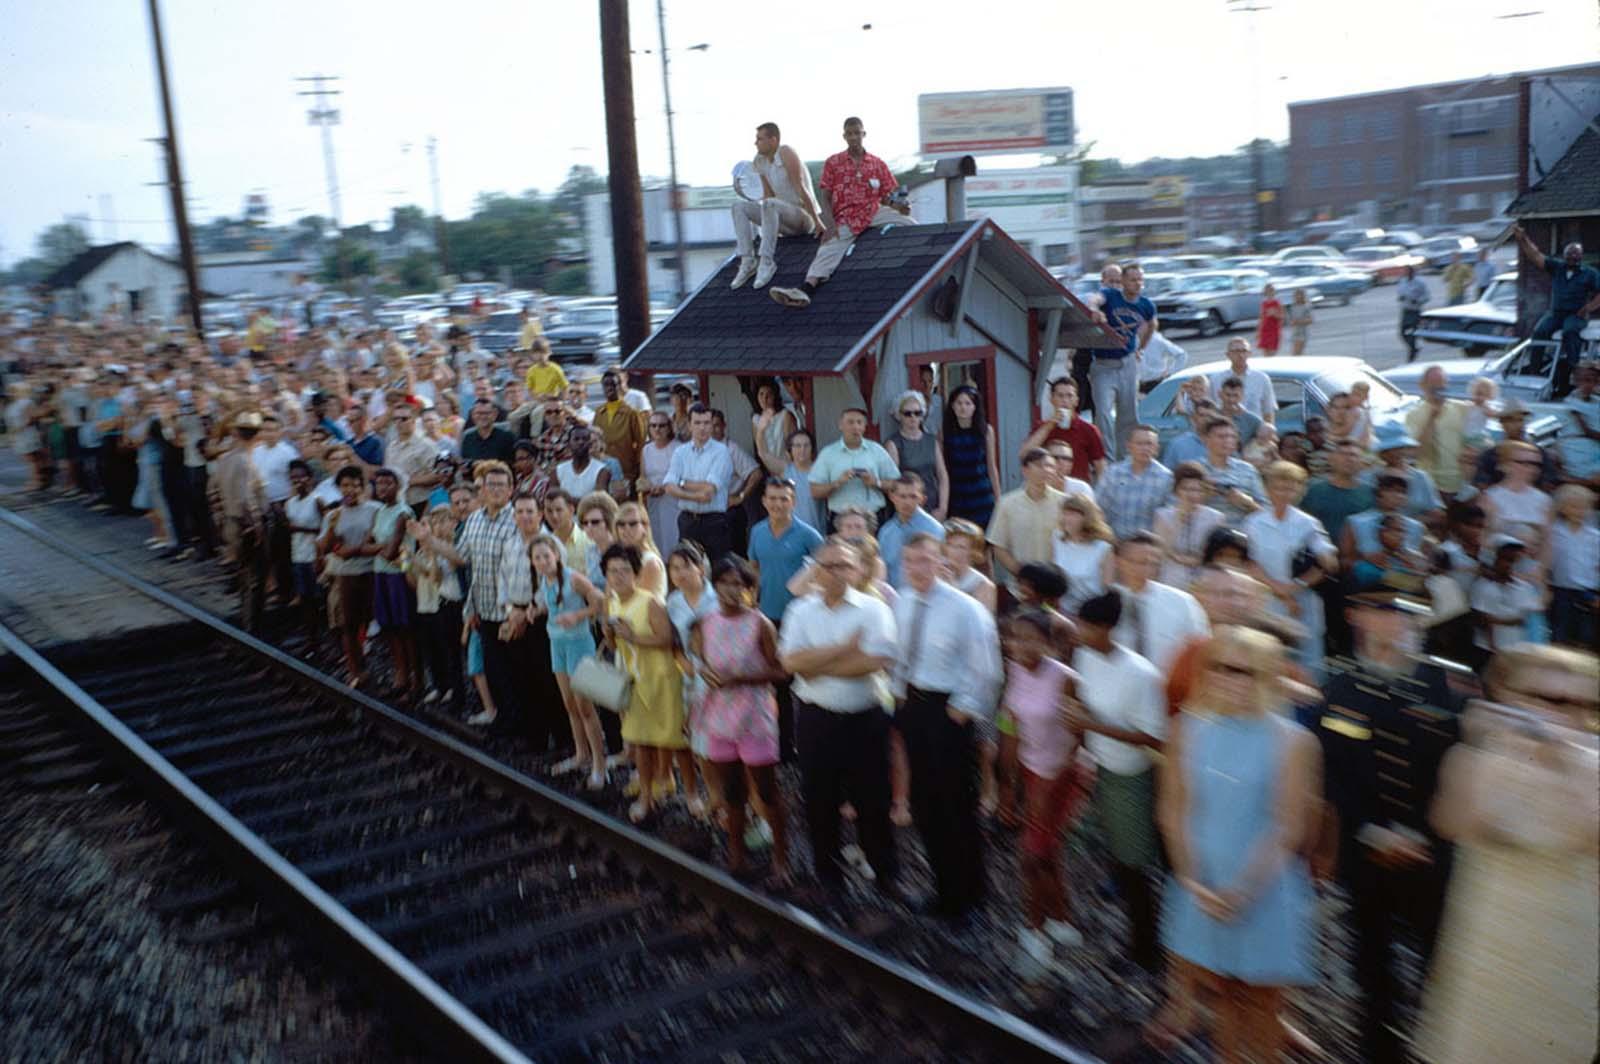 June 8, 1968.